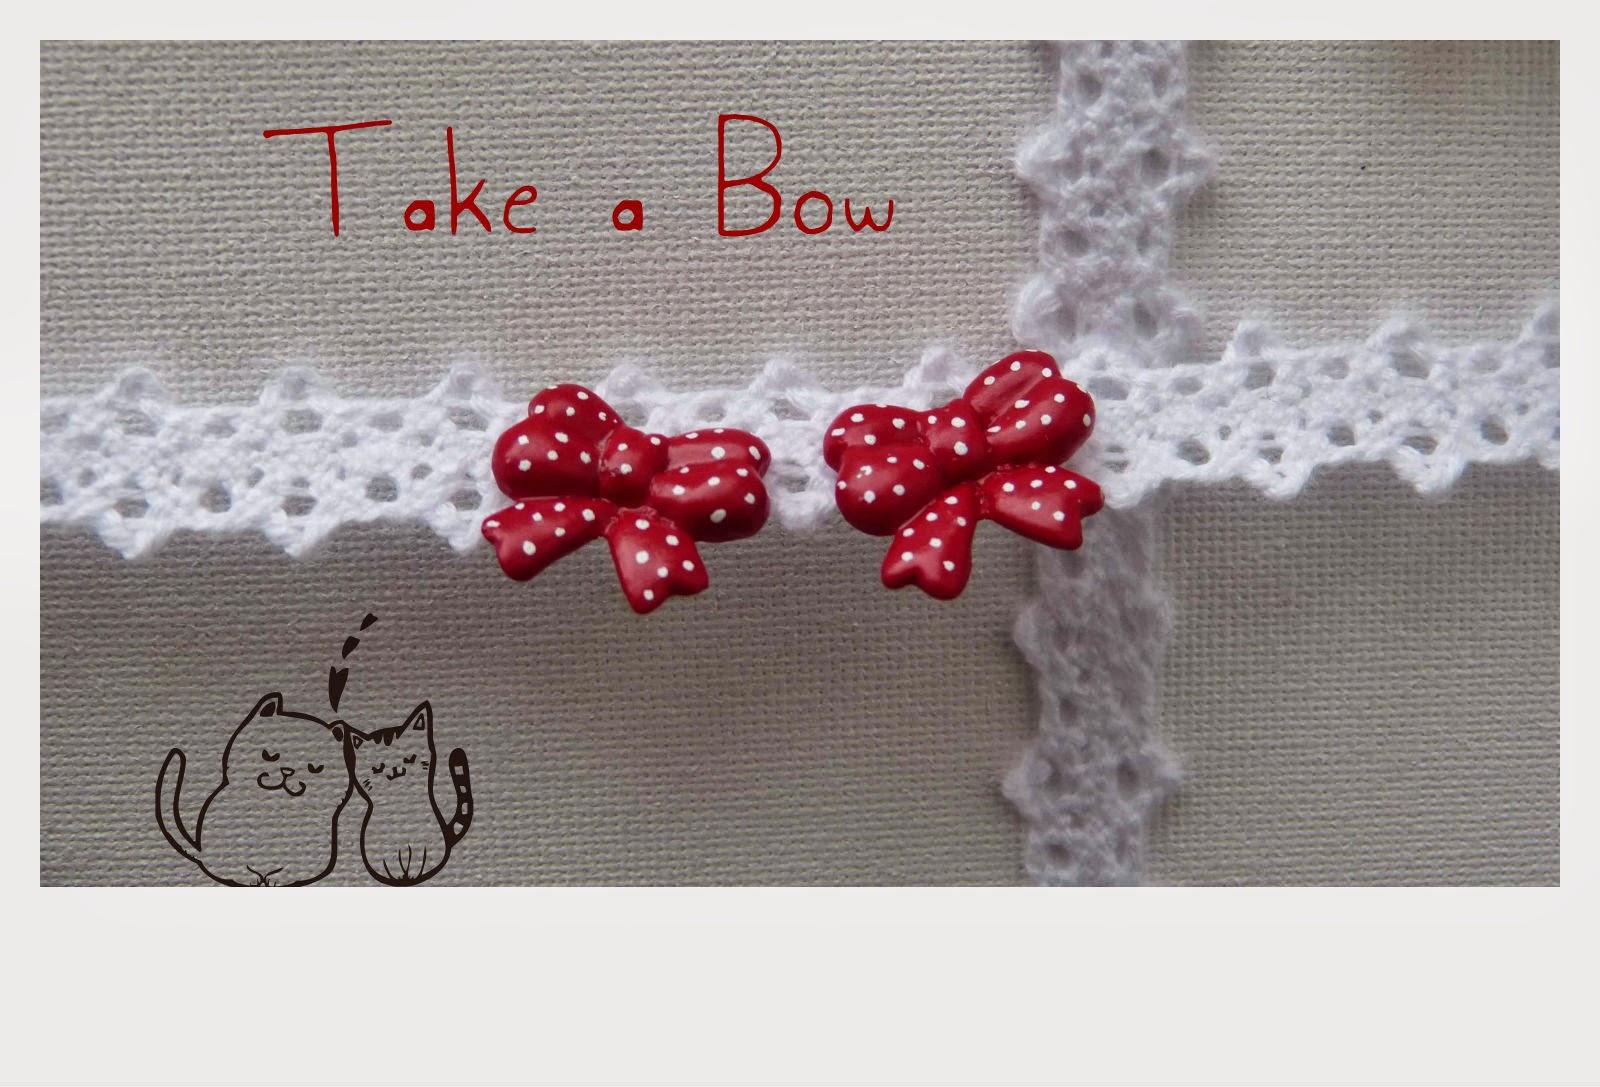 http://www.alittlemarket.com/boucles-d-oreille/fr_boucles_d_oreilles_take_a_bow_noeuds_en_fimo_-7957815.html